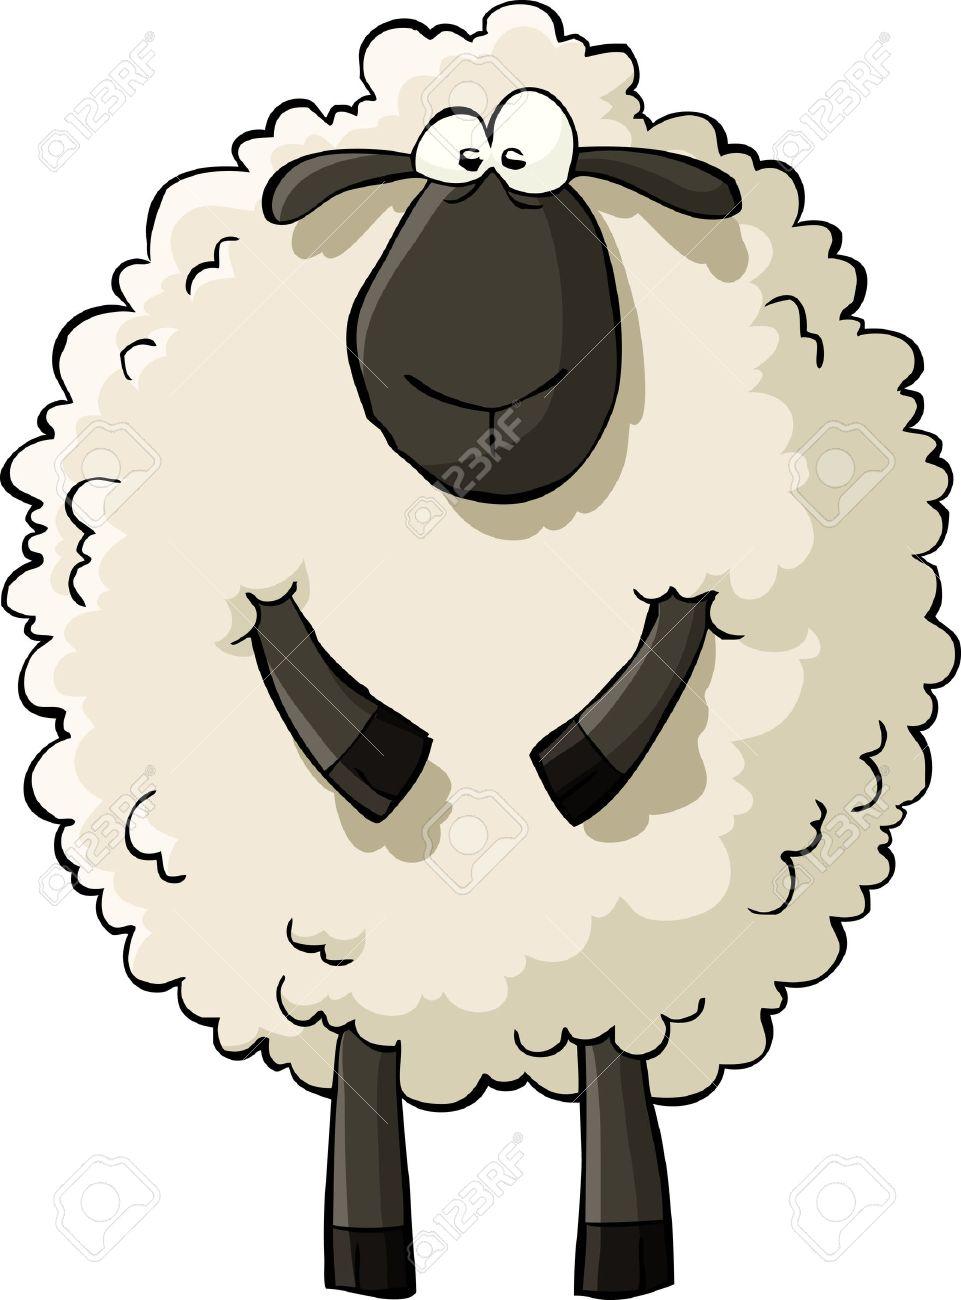 15,766 Sheep Cartoon Stock Vector Illustration And Royalty Free ...